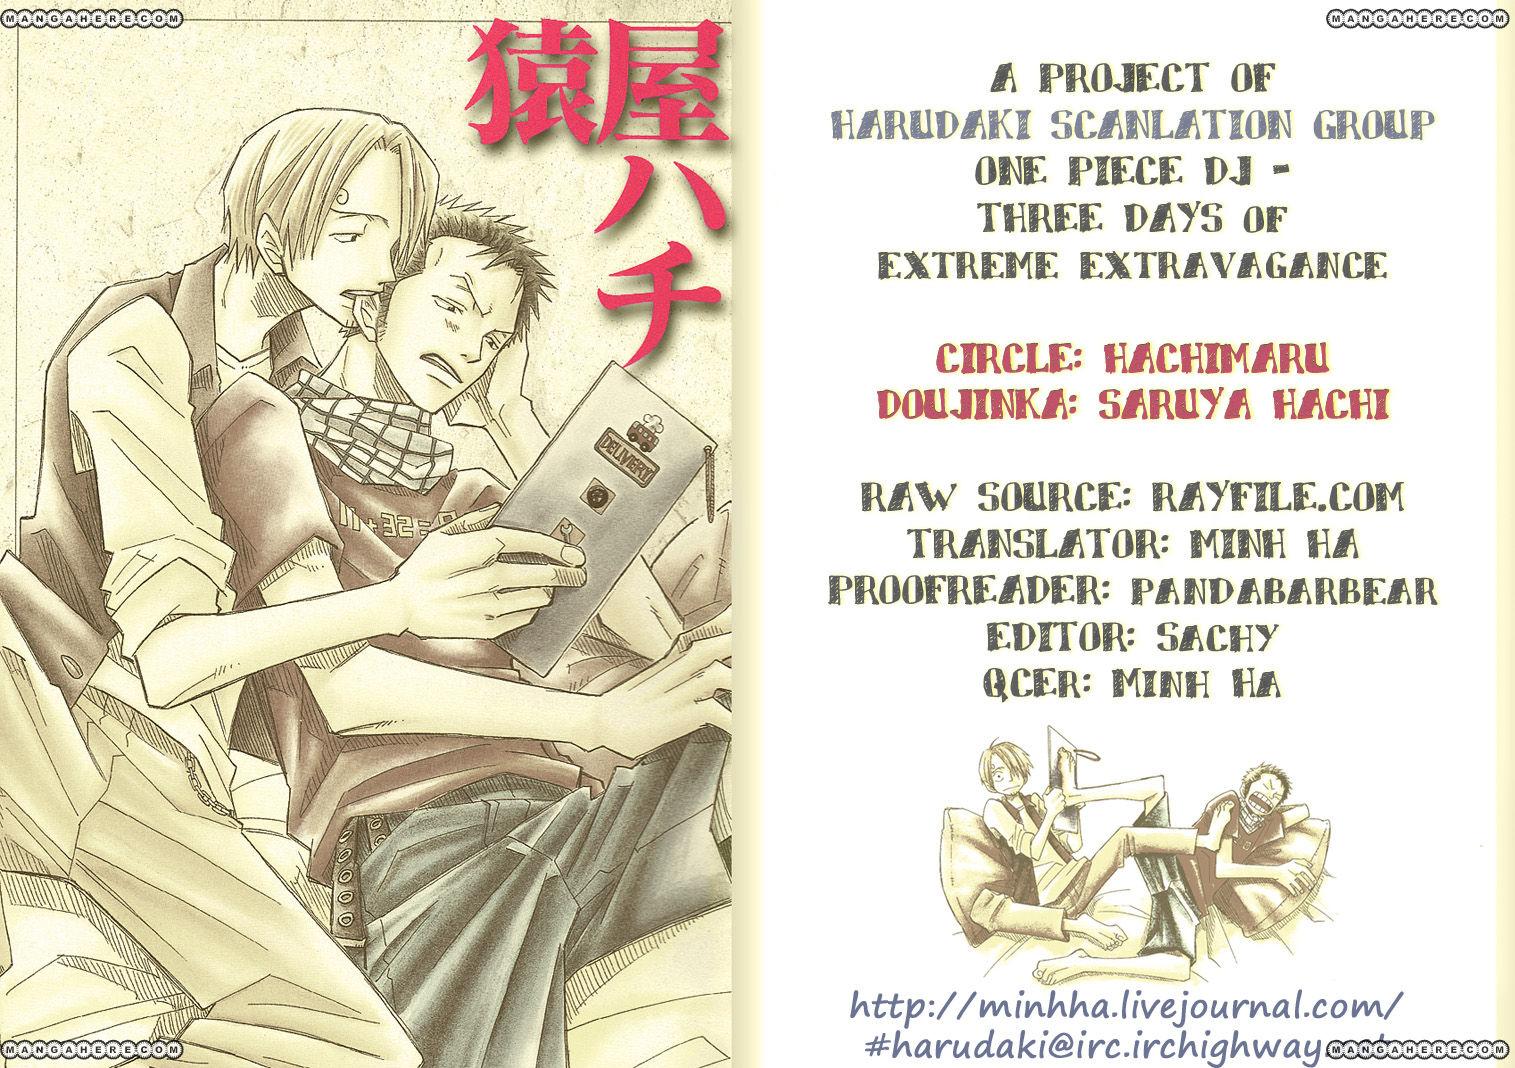 One Piece dj - Three Days of Extreme Extravagance 1 Page 2